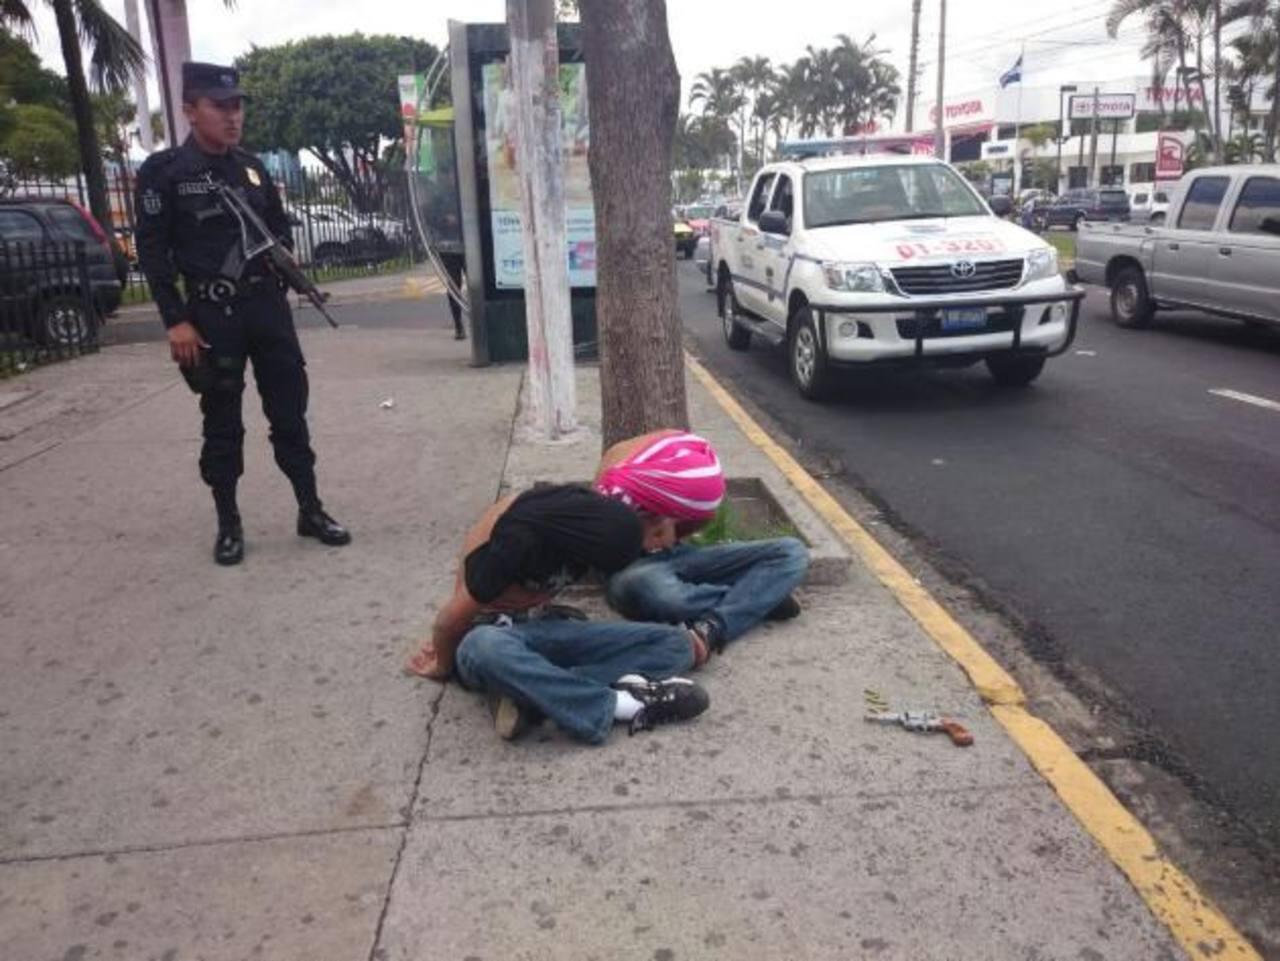 Capturan a dos menores al asaltar en bus ruta 44